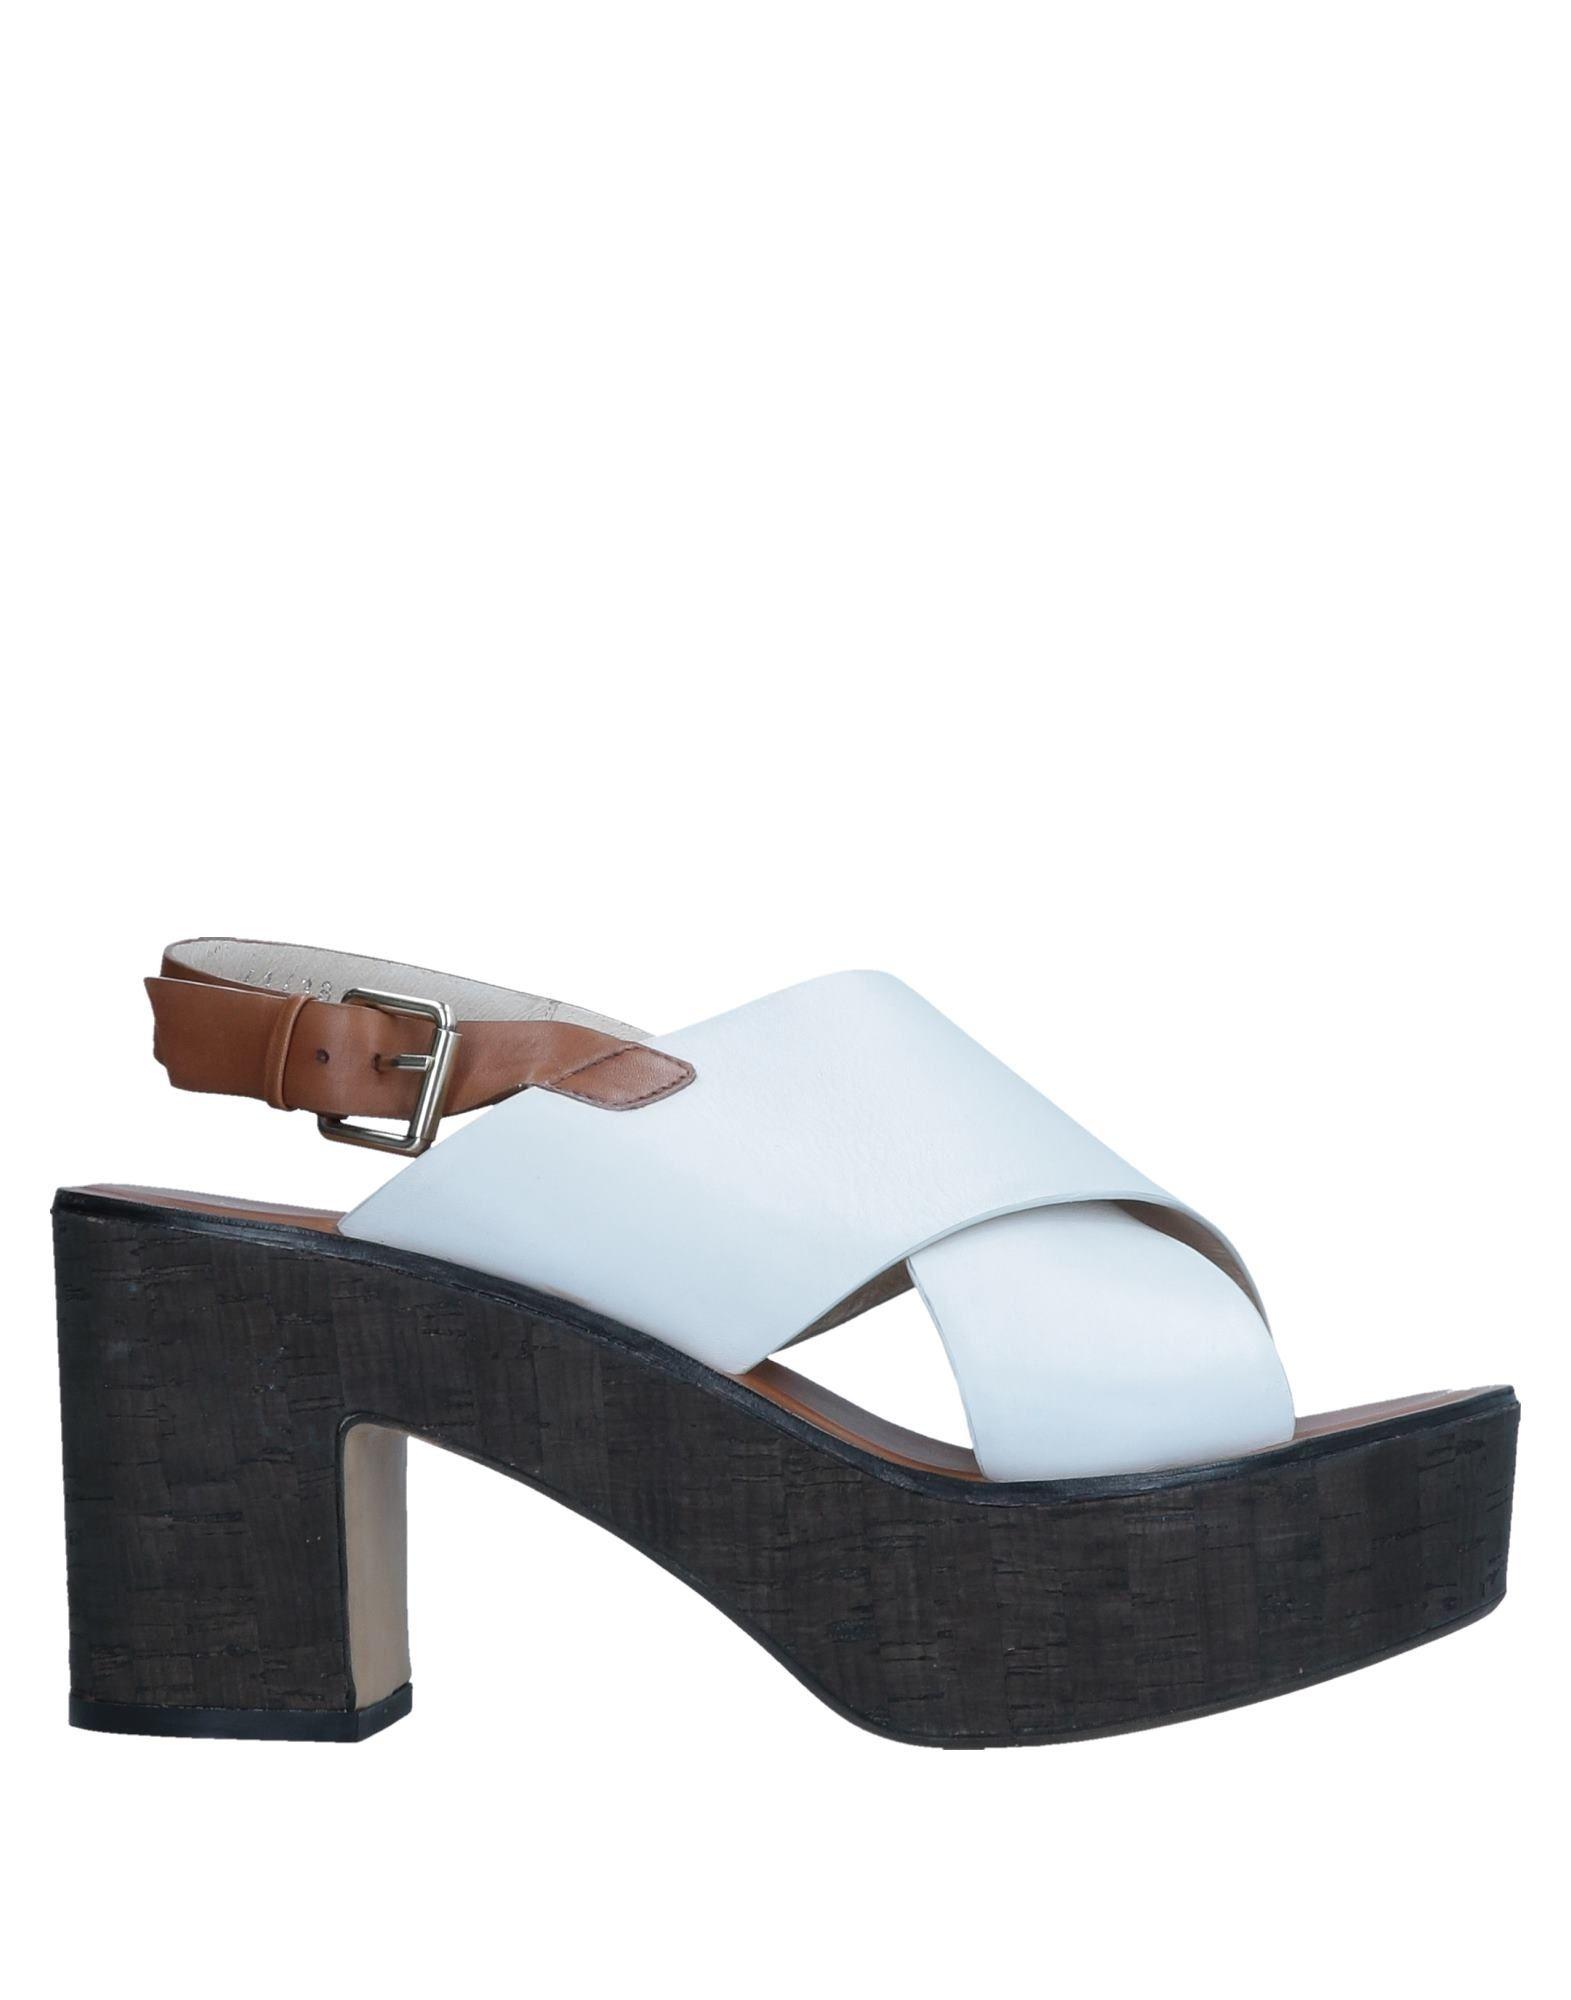 Altraofficina Sandalen Damen  11552422XW Gute Qualität beliebte Schuhe